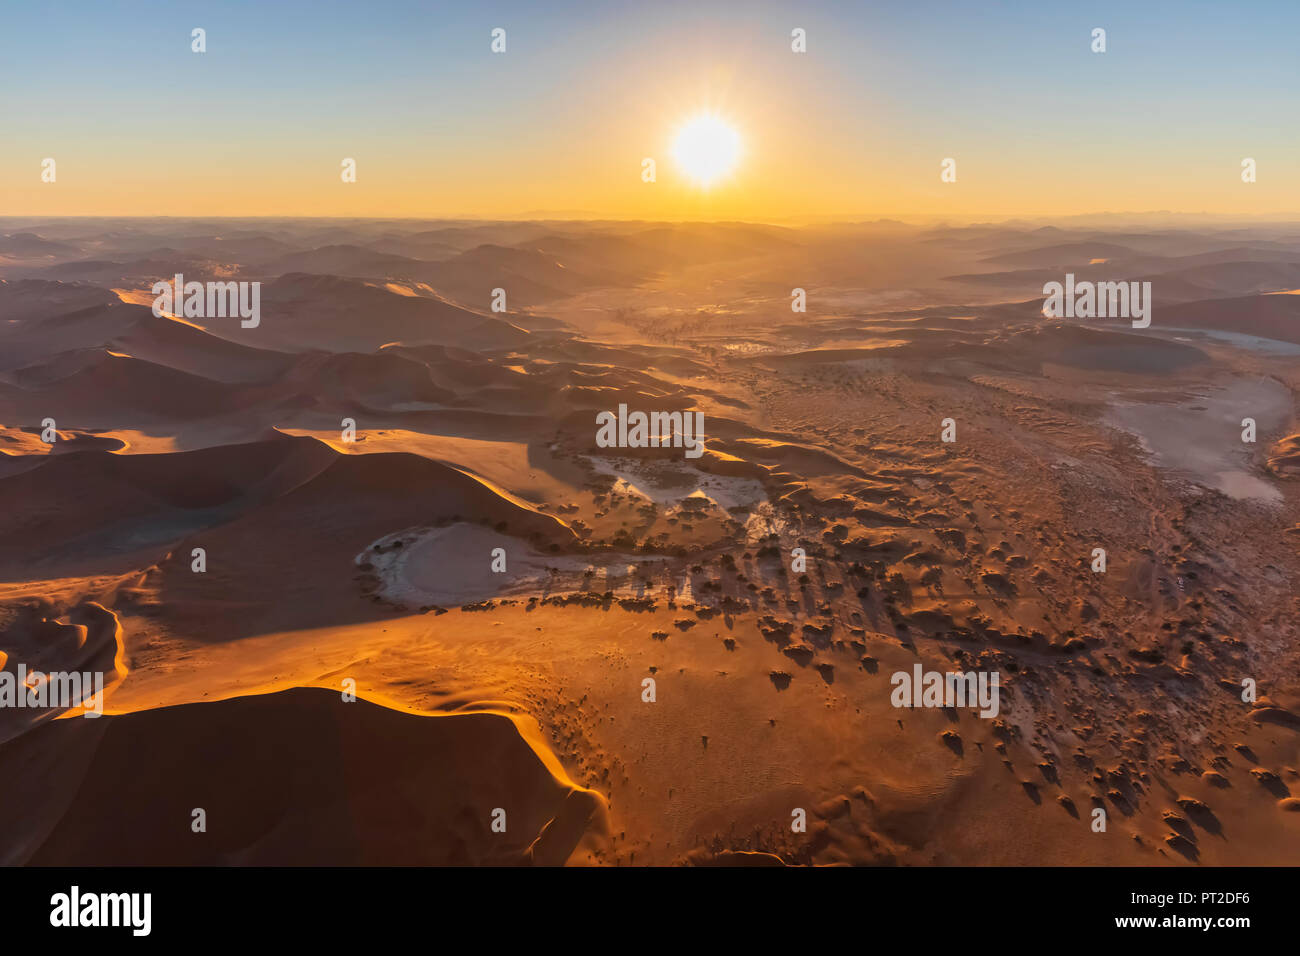 Africa, Namibia, Namib desert, Namib-Naukluft National Park, Aerial view of desert dunes, Nara Vlei, Sossusvlei and 'Big Mama' Stock Photo